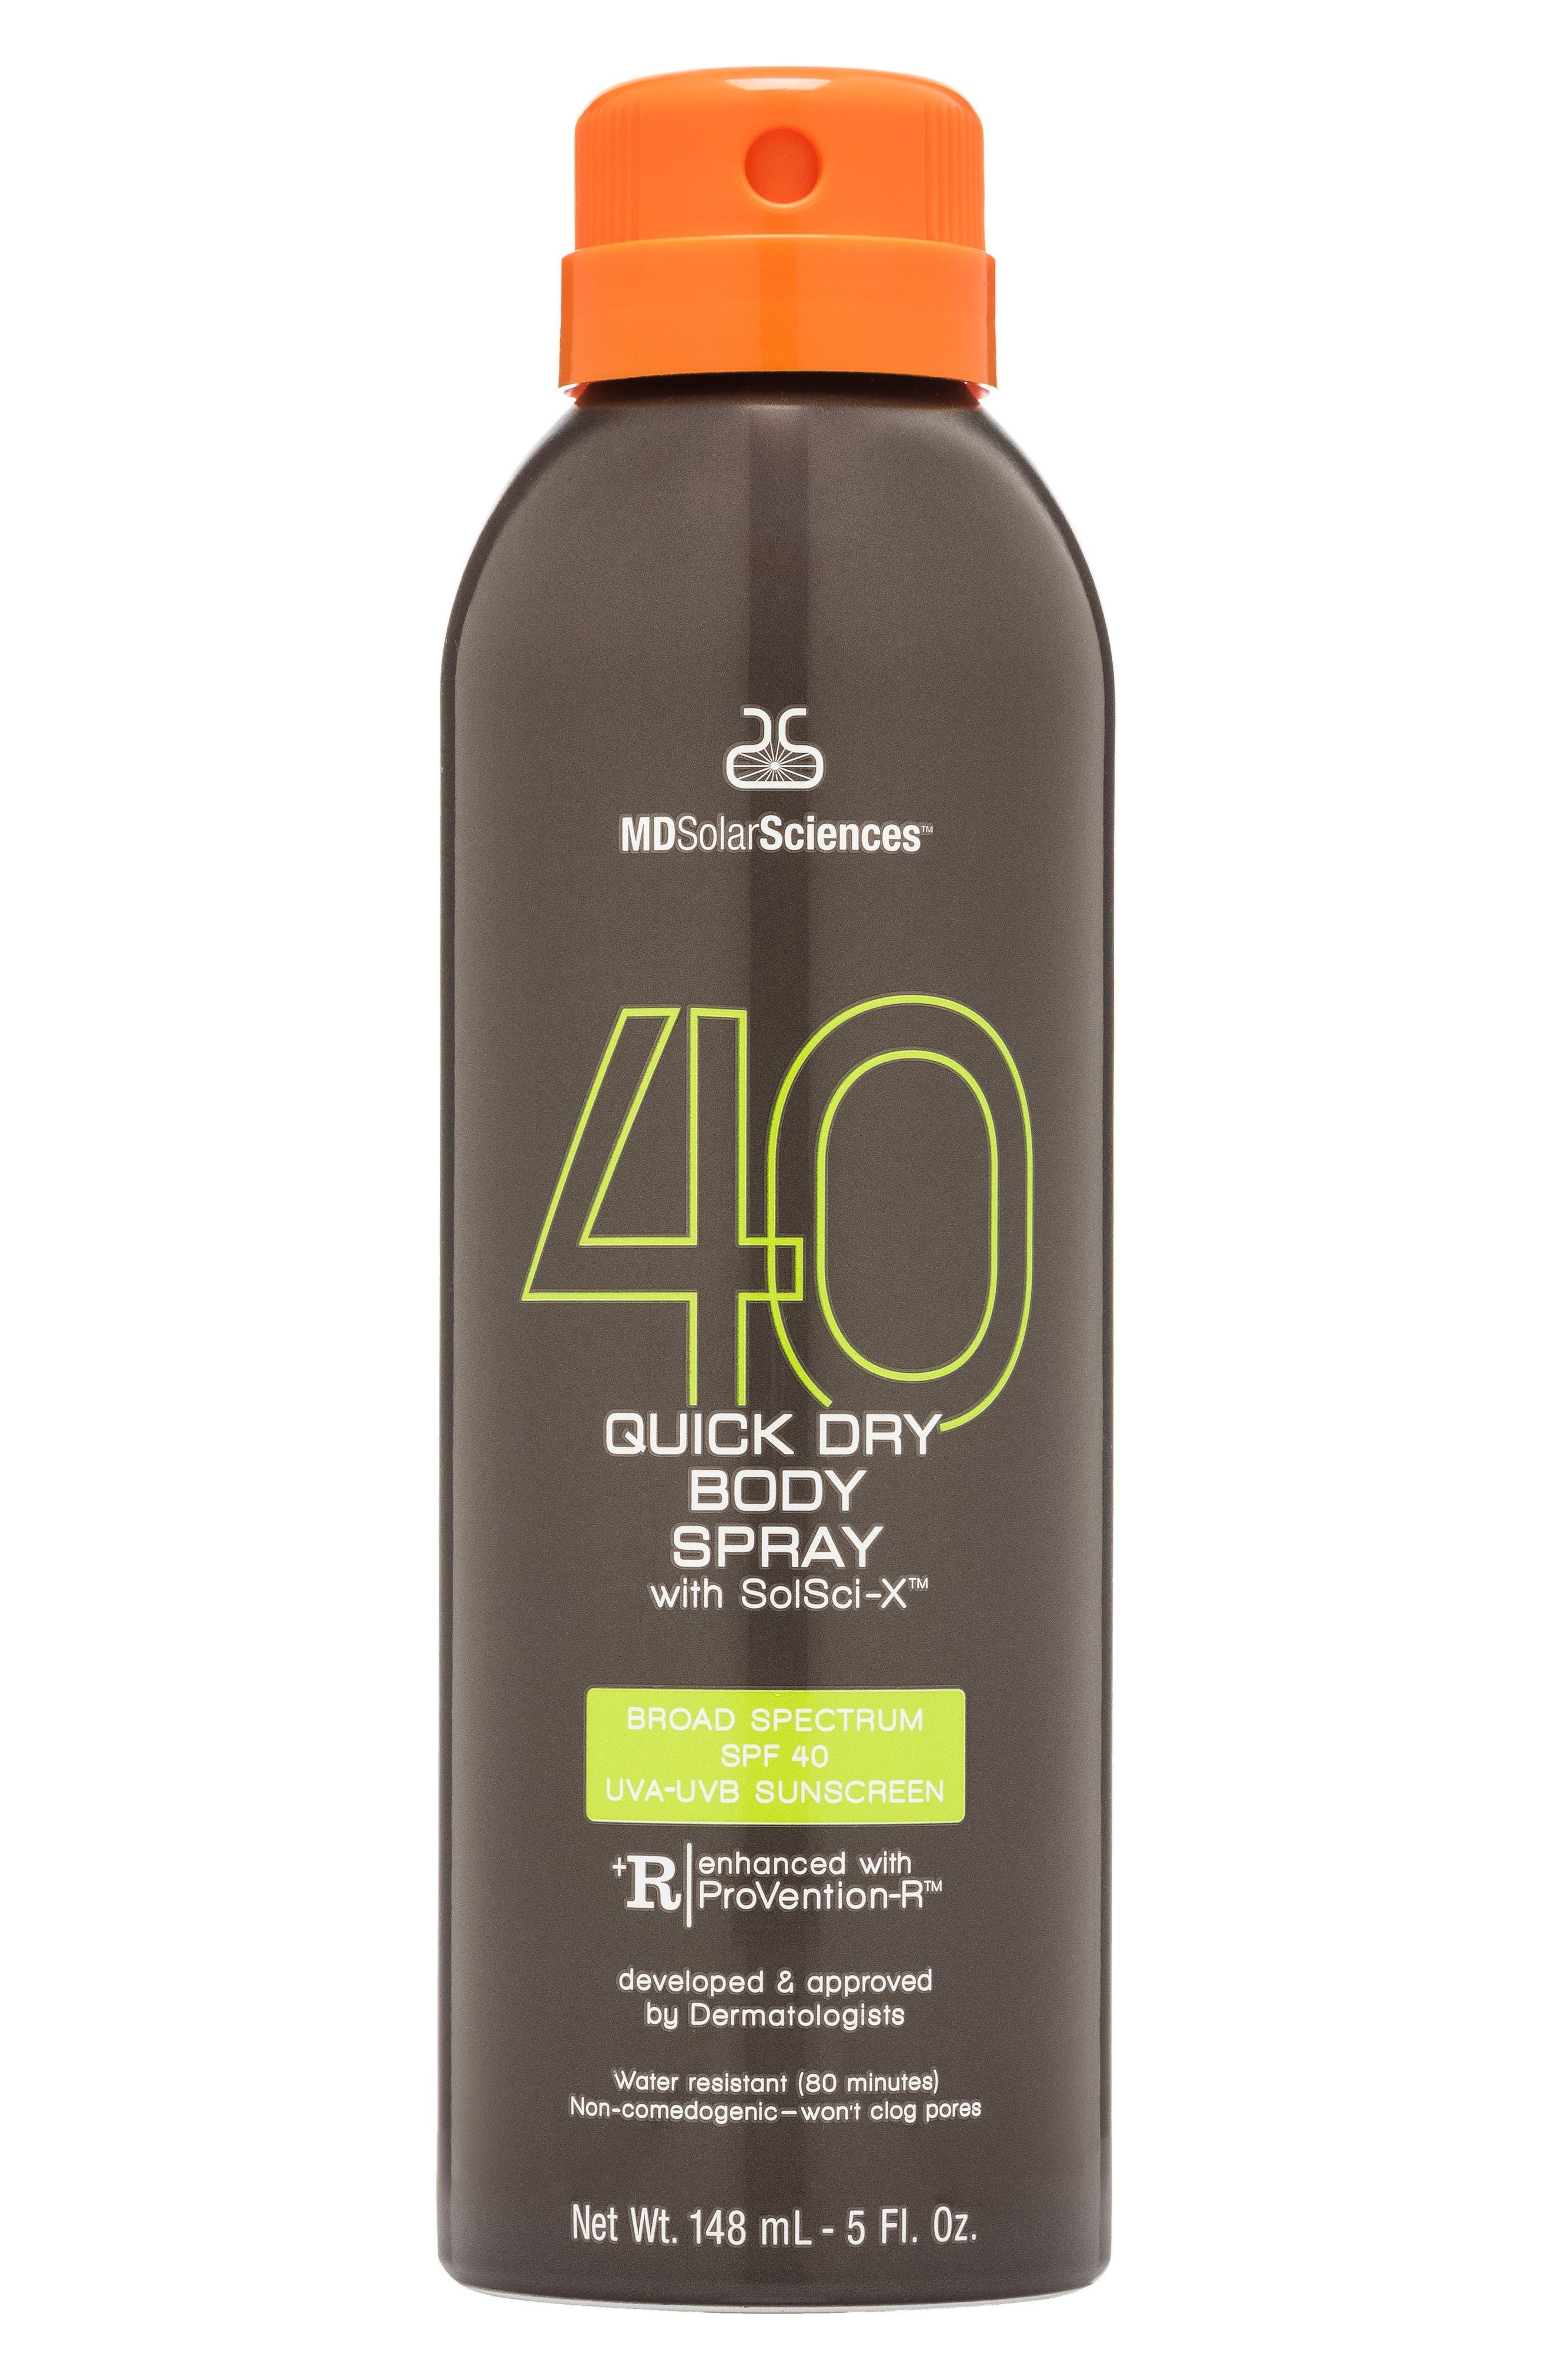 Main Image - MDSolarSciences™ Quick Dry Body Spray Broad Spectrum SPF 40 Sunscreen